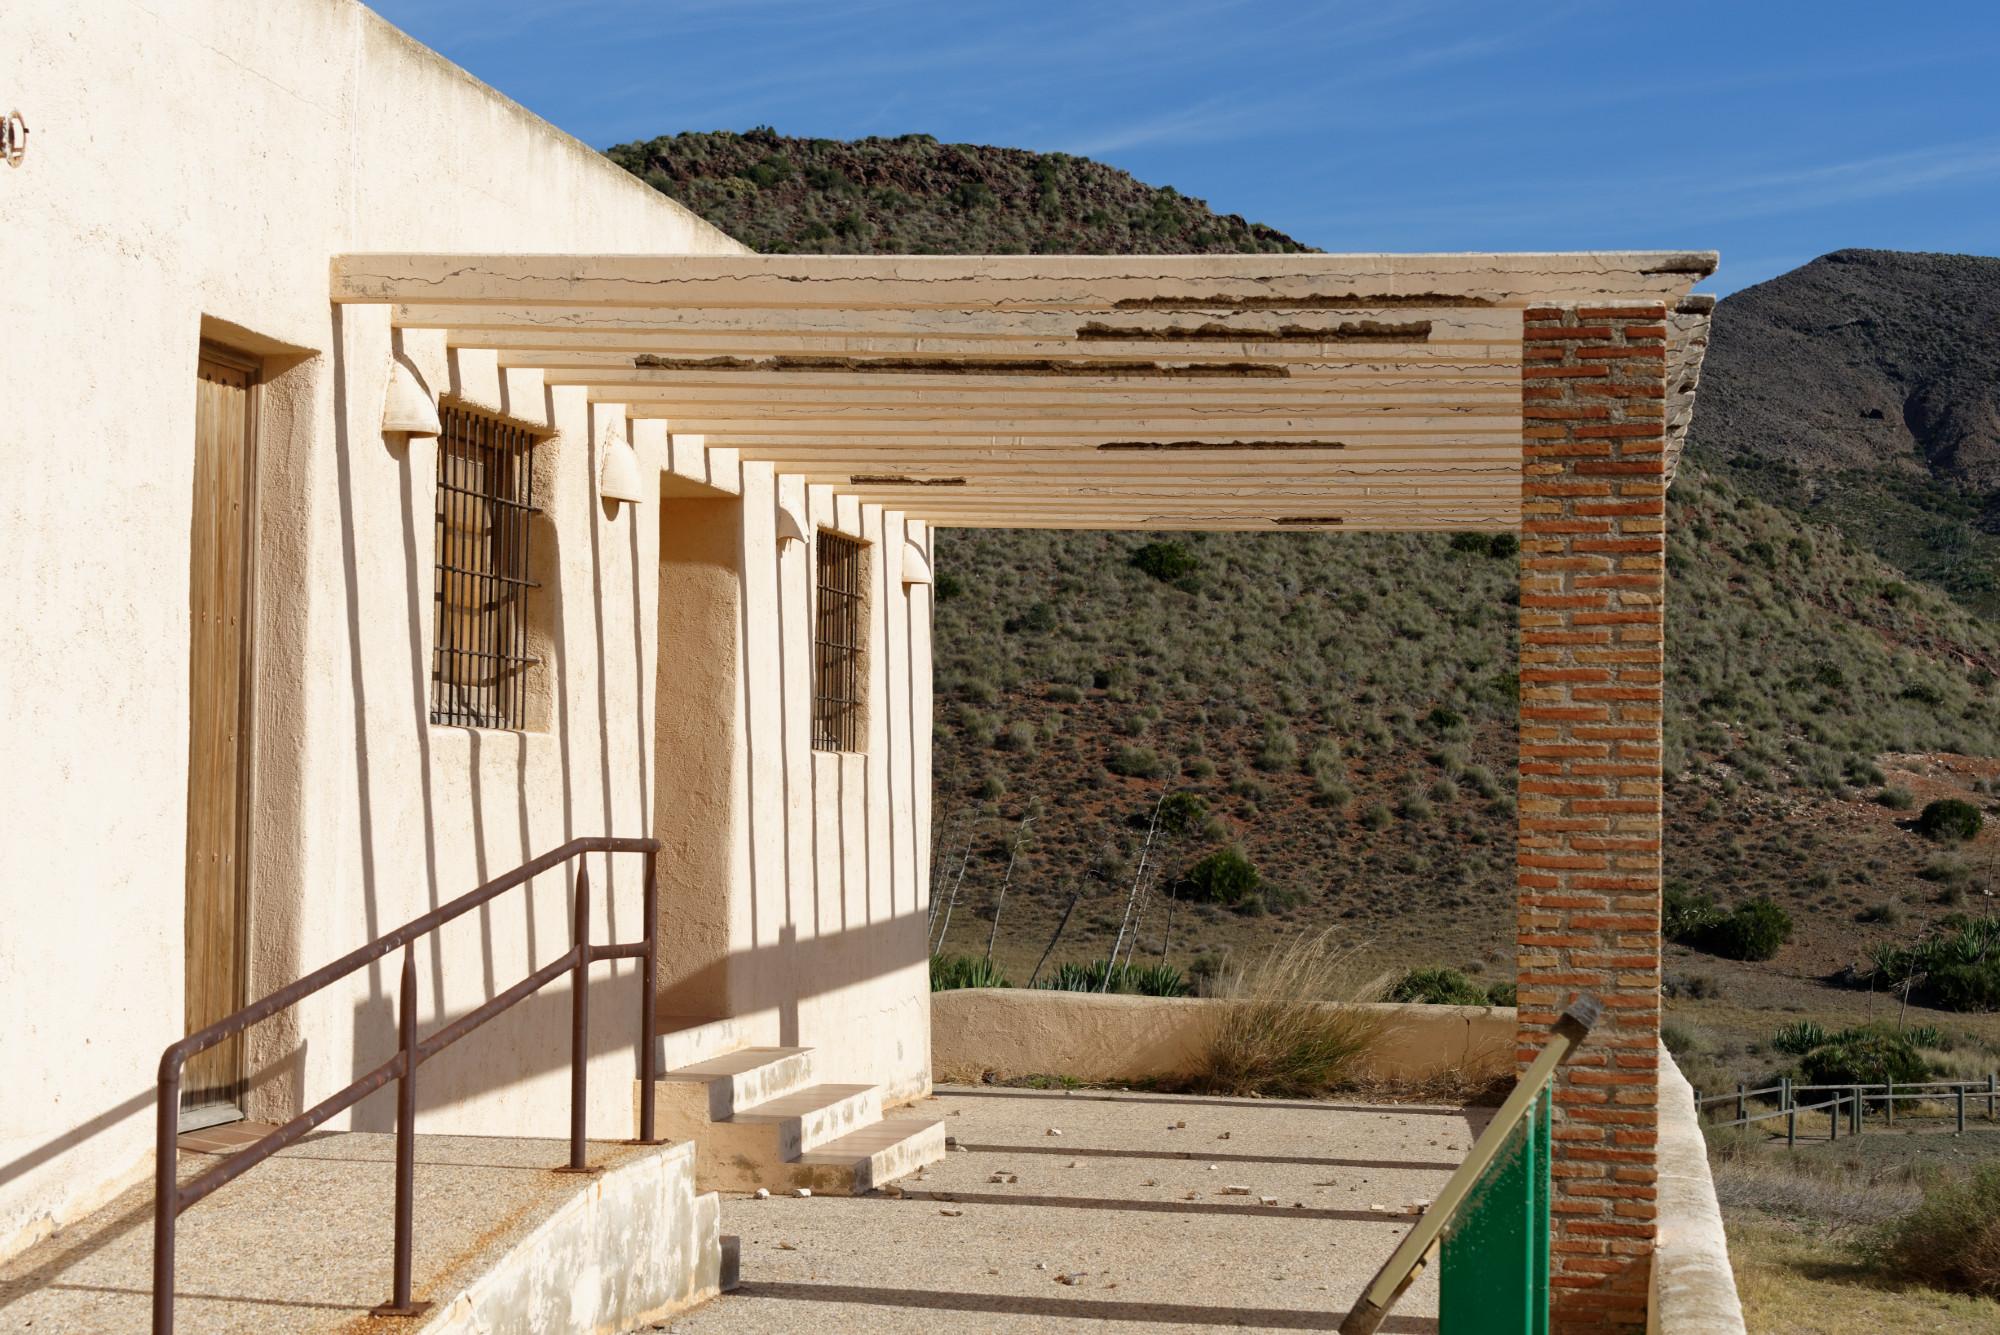 171214-San Jose-Playa del Monsul (Cabo de Gata-Andalousie) (138)